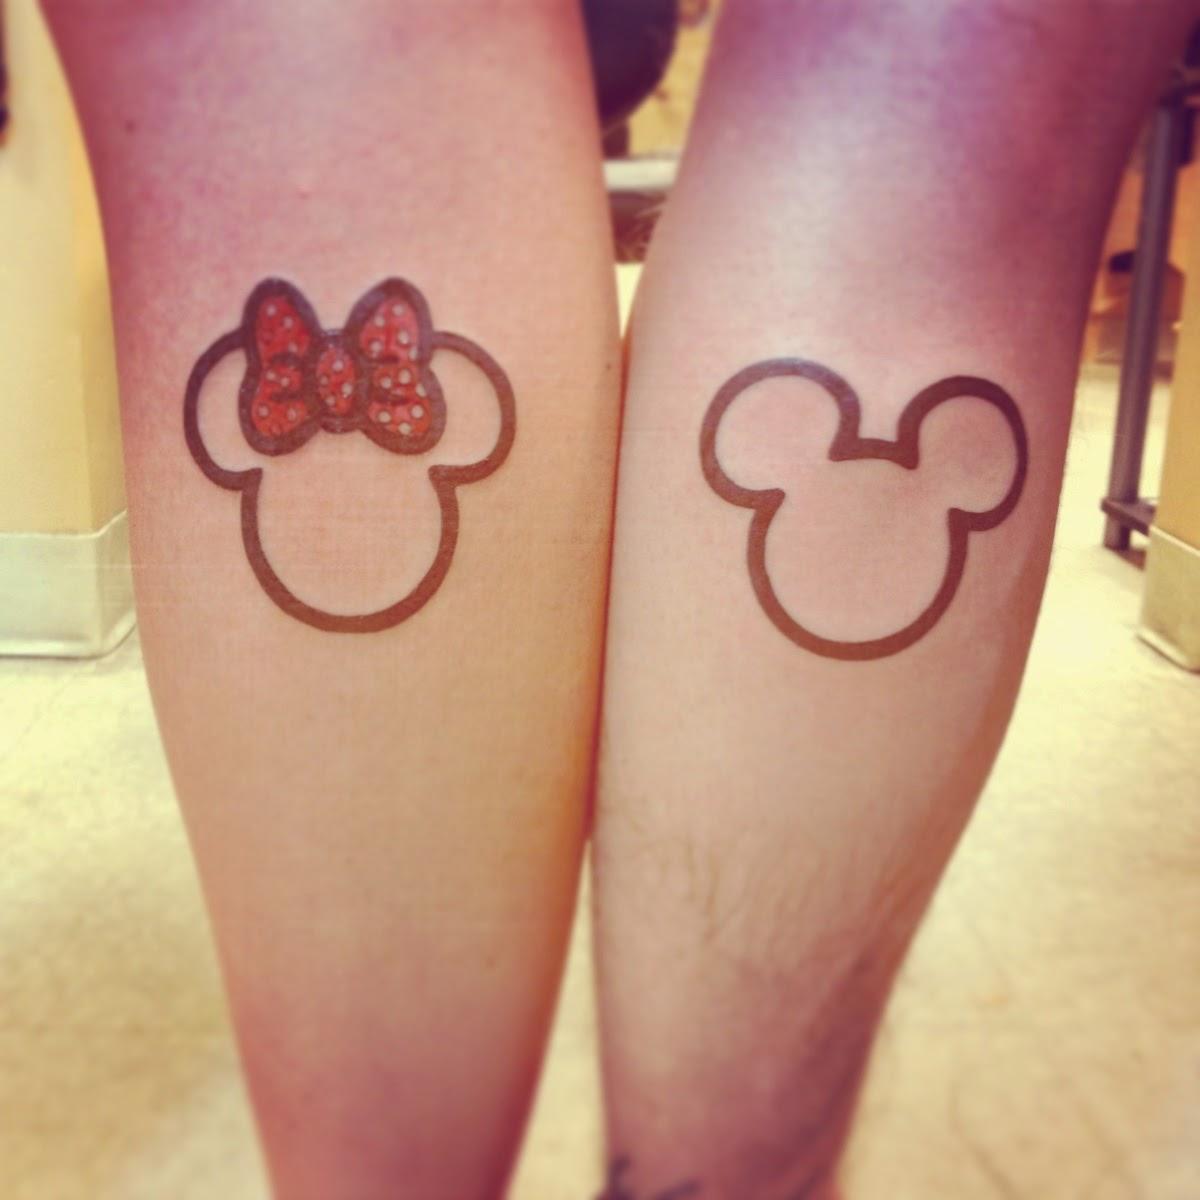 Disney tattoos and tattoo designs - Most Amazing Cute Disney Tattoos Designs Ideas You Ll Love